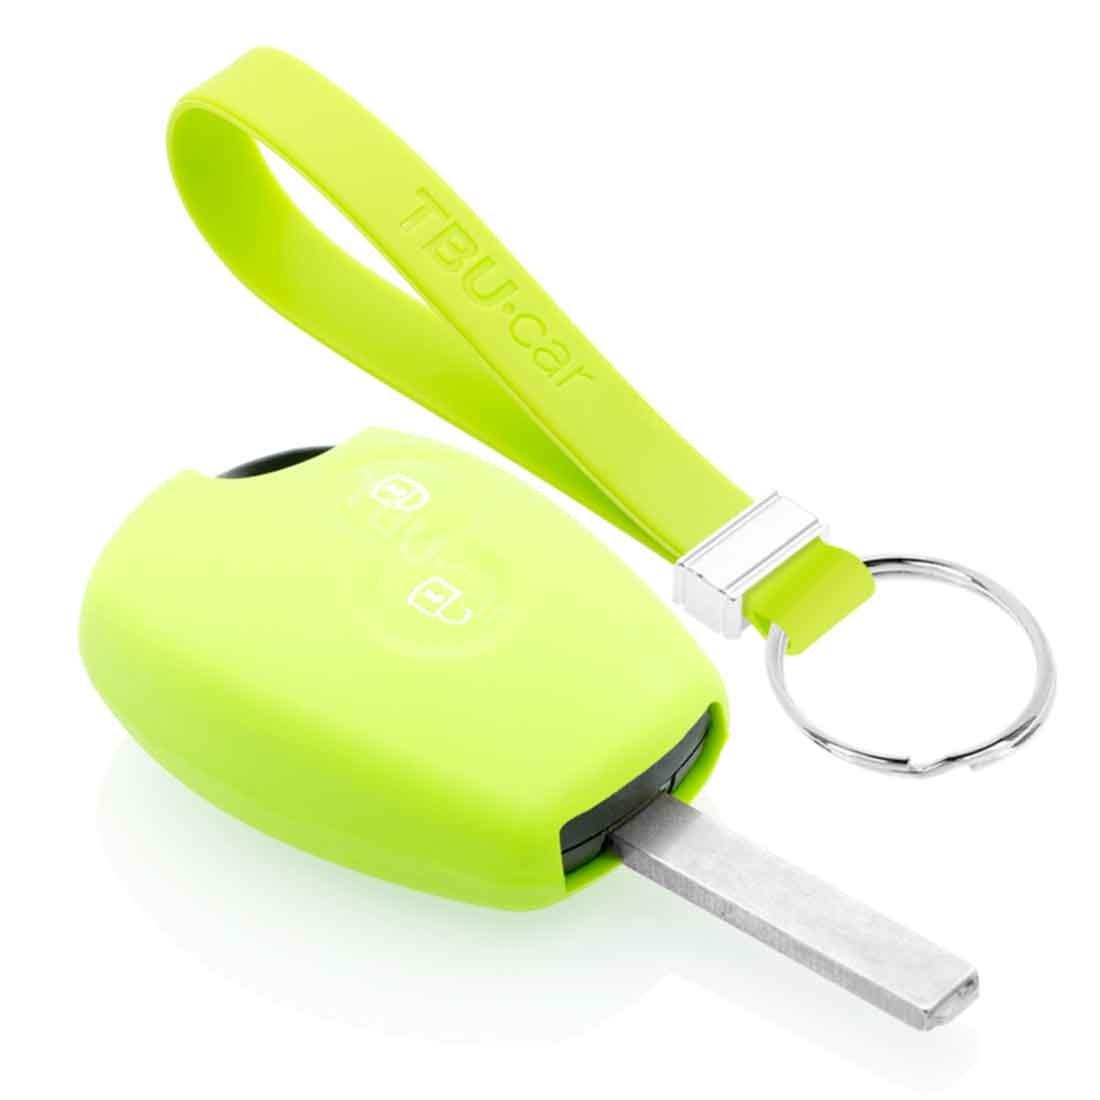 TBU car TBU car Sleutel cover compatibel met Dacia - Silicone sleutelhoesje - beschermhoesje autosleutel - Lime groen